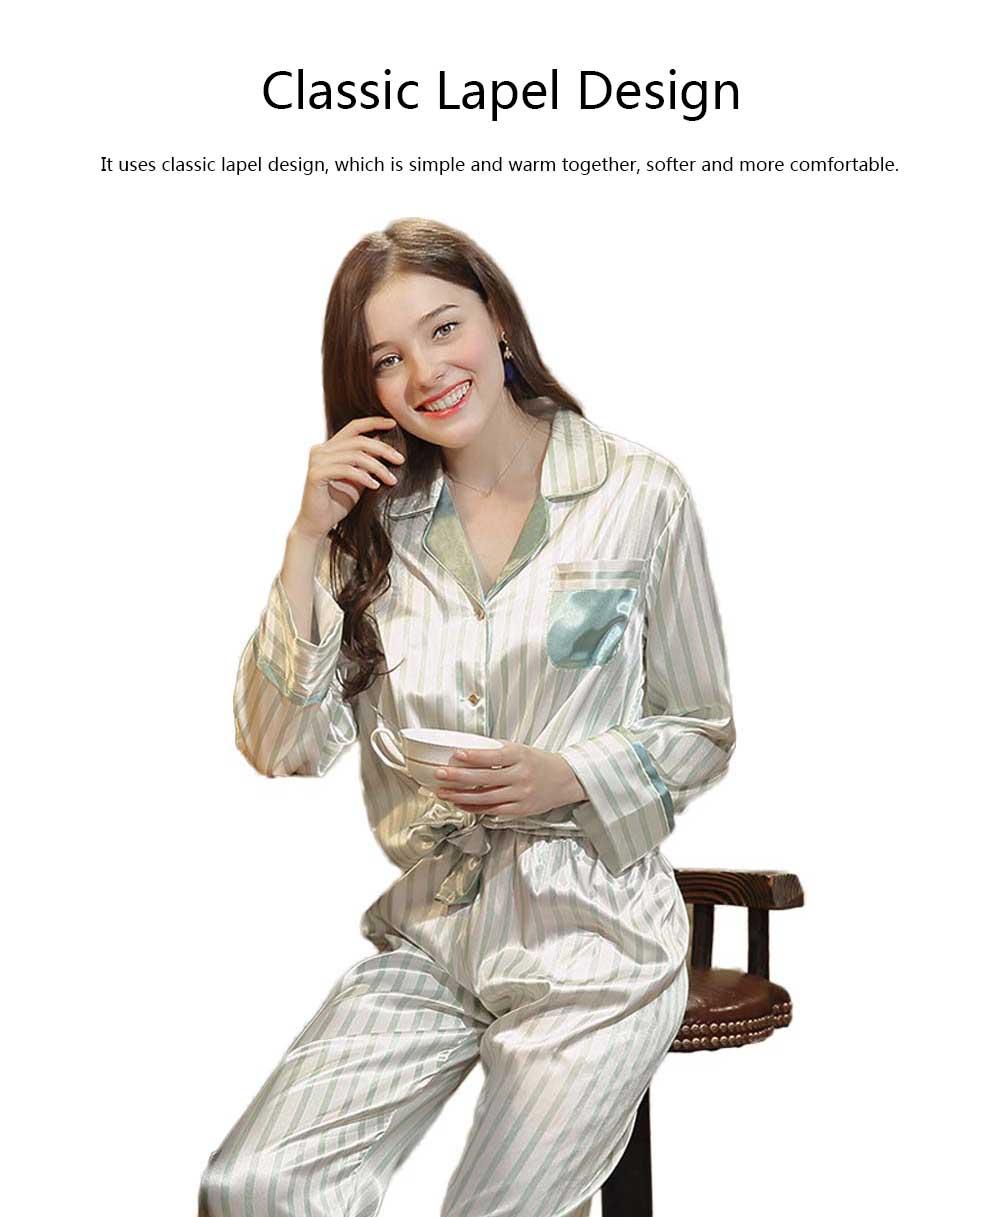 Imitation Silk Fabric Long-sleeved Pajamas set, Classic Lapel Fashion Casual Striped Tracksuit, Spring and Autumn 2019 5